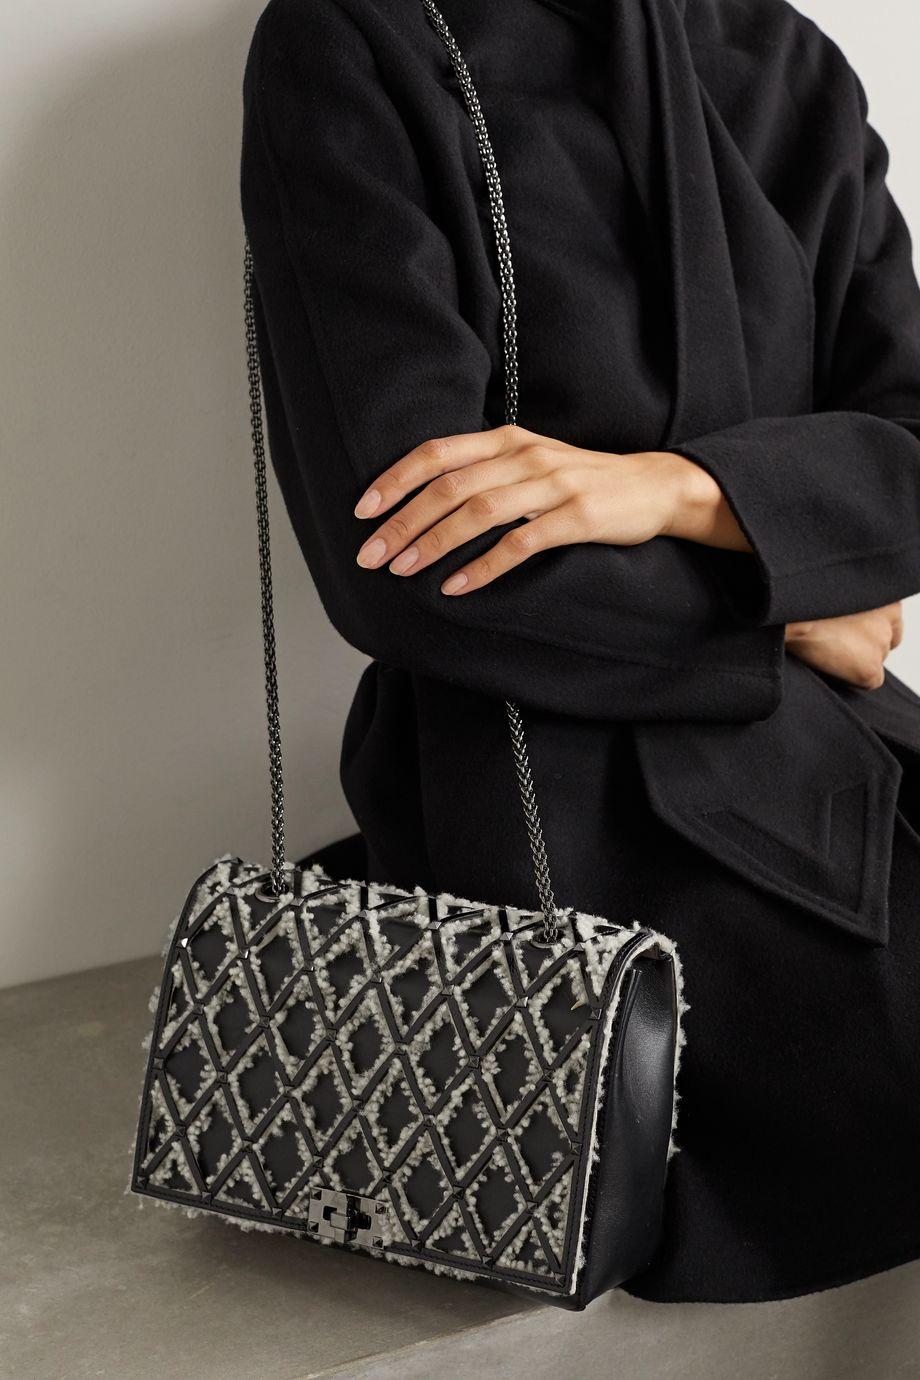 Valentino Valentino Garavani Beehive shearling-trimmed studded leather shoulder bag